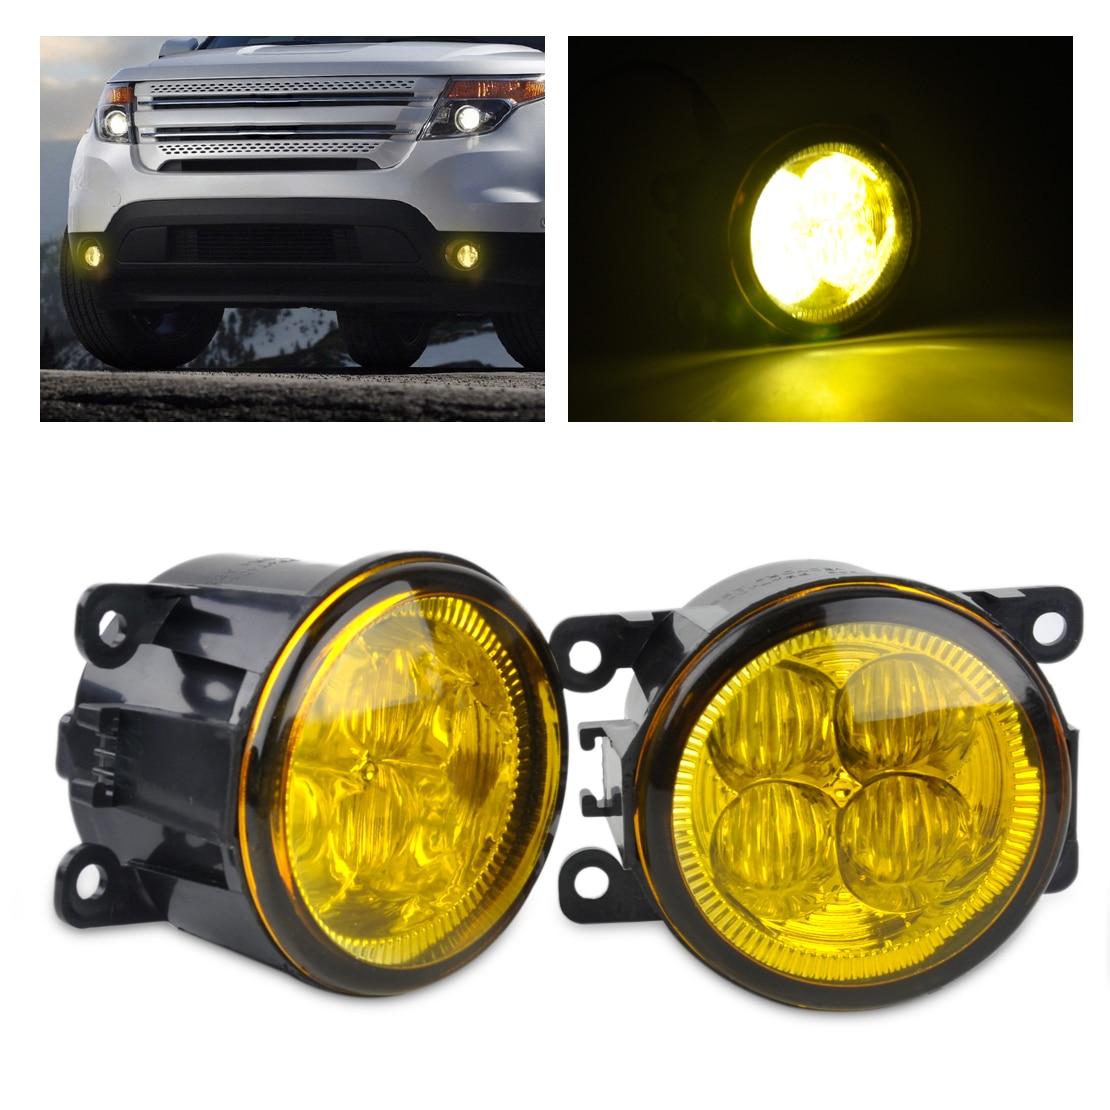 beler 2pcs Highlighted LED Fog Light Lamp with Yellow Lens AC2592111 3225-2050B for Ford Focus Acura Honda Subaru Nissan Suzuki 3225 osc 1m 1mhz 1 000mhz 3 2 2 5mm